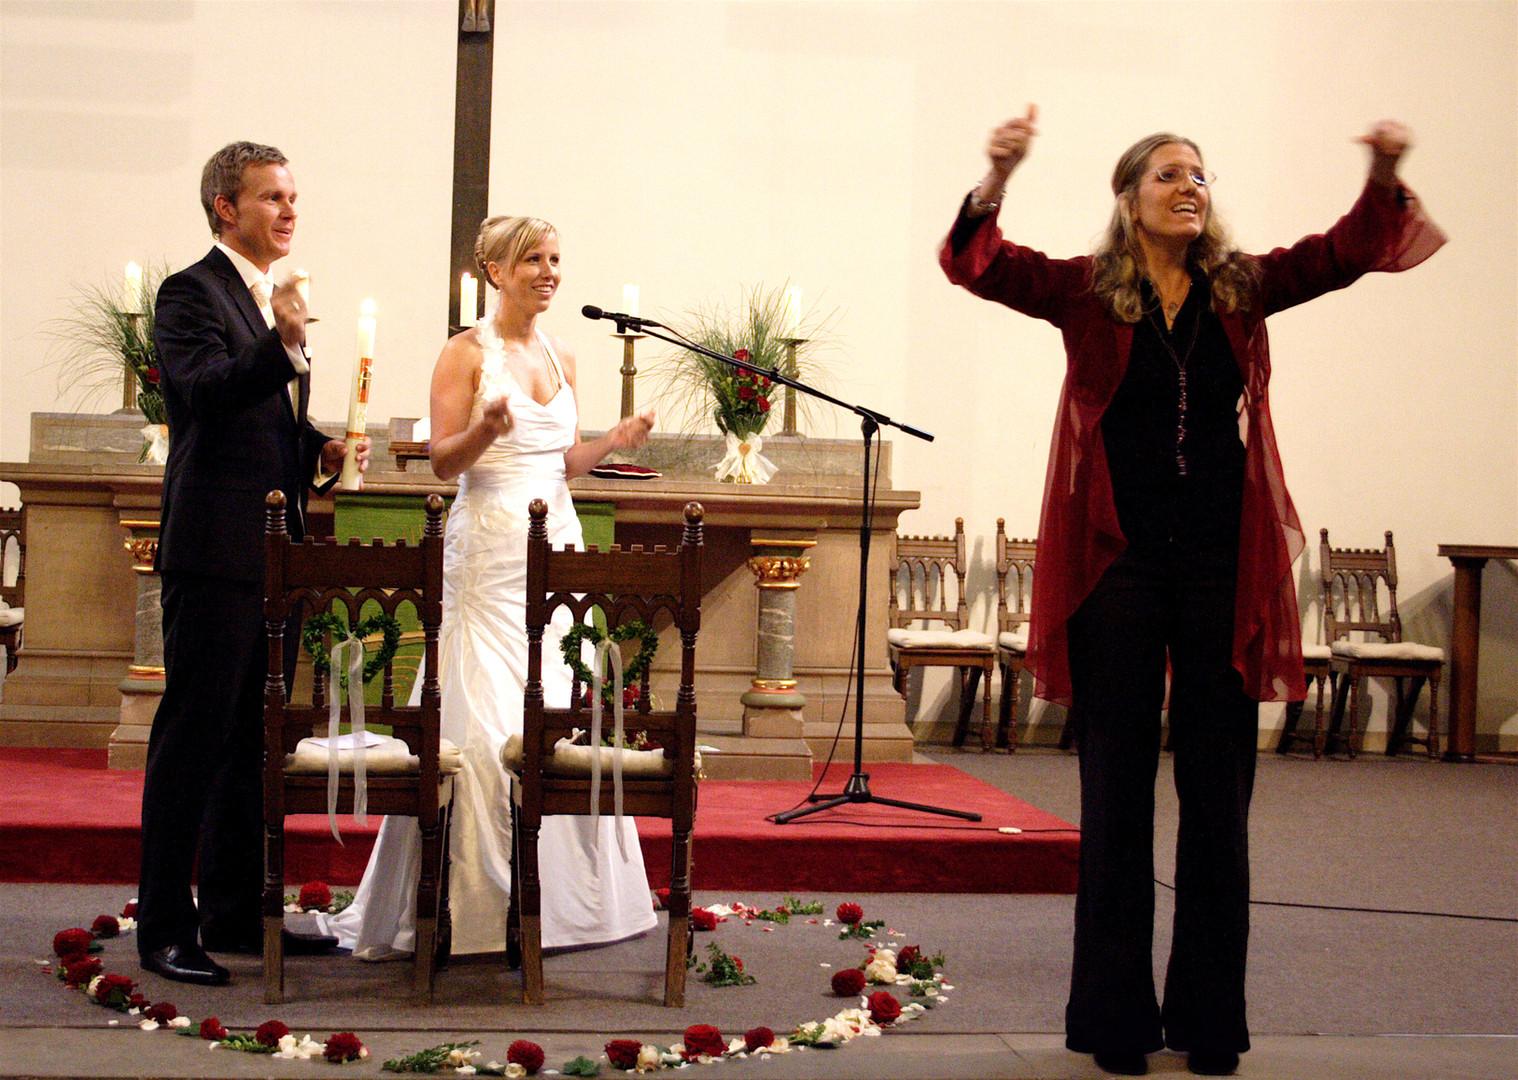 Bianca Kirche mit Brautpaar Gesang Anleiten des Publikums